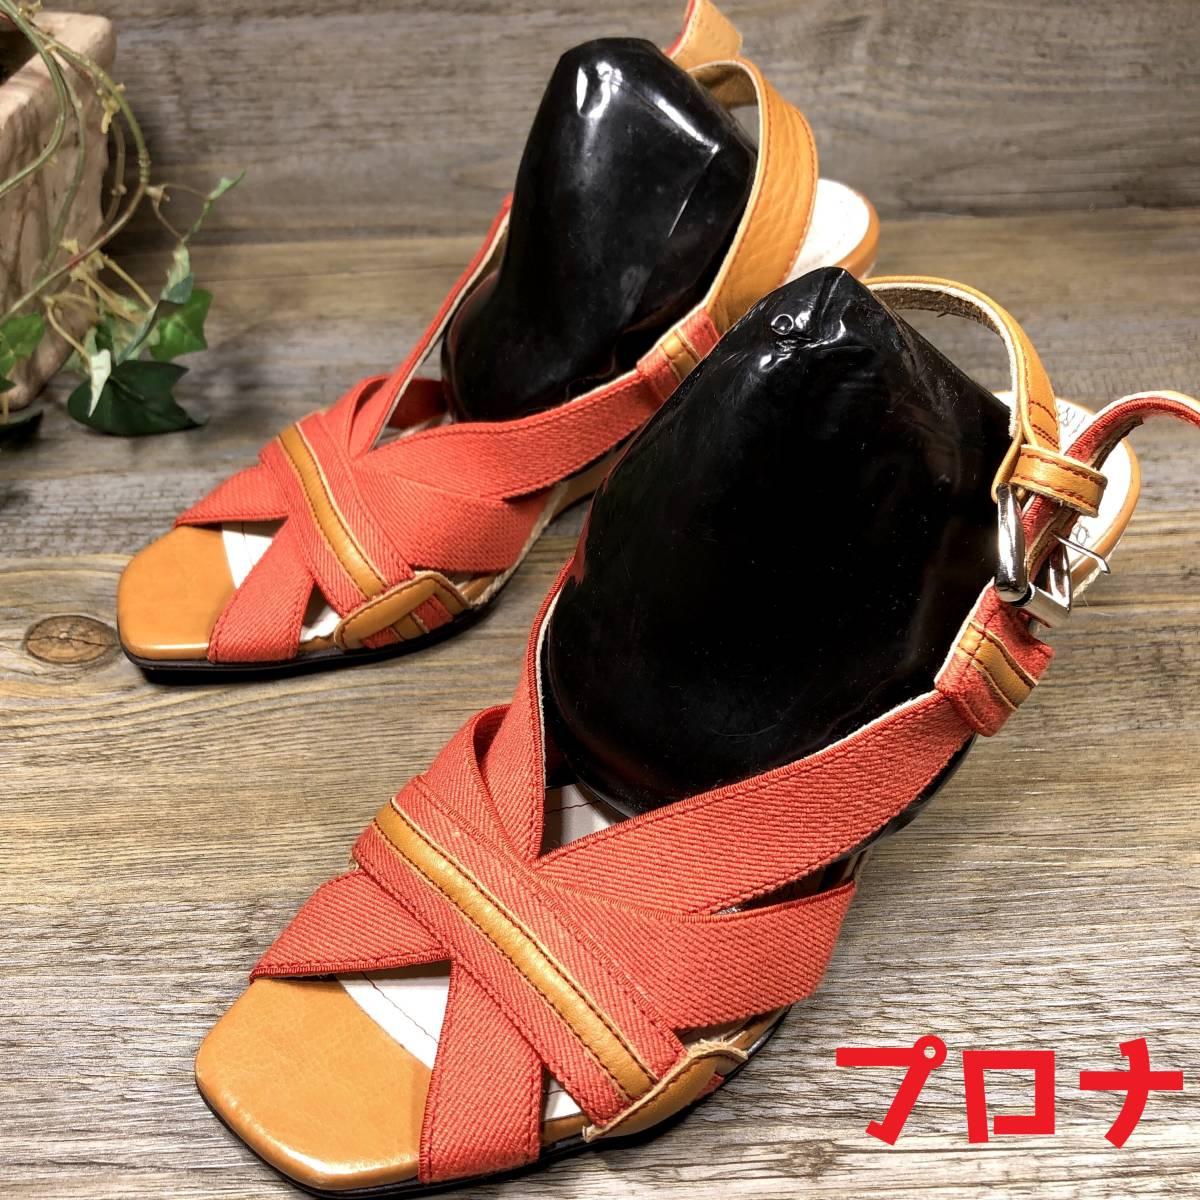 ■REGAL■ 23cm オレンジ リーガル サンダル レディース ウェッジソール 靴 くつ 中古 宅急便 即決_画像1